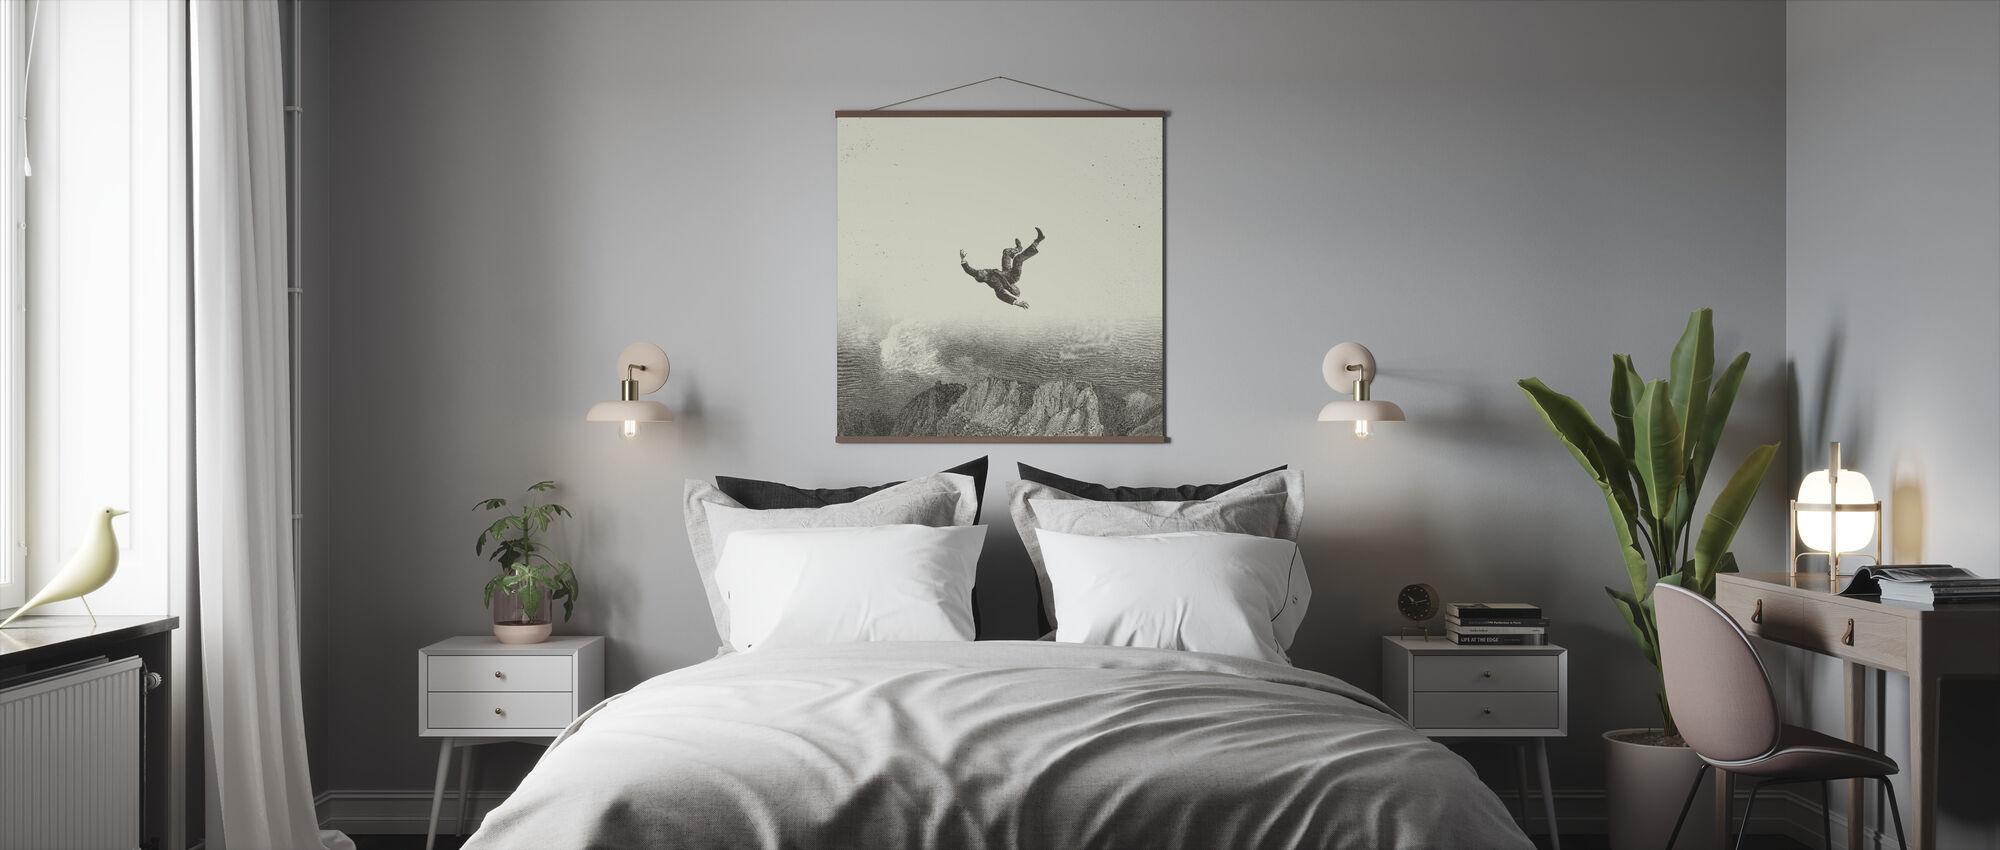 Falling - Poster - Bedroom